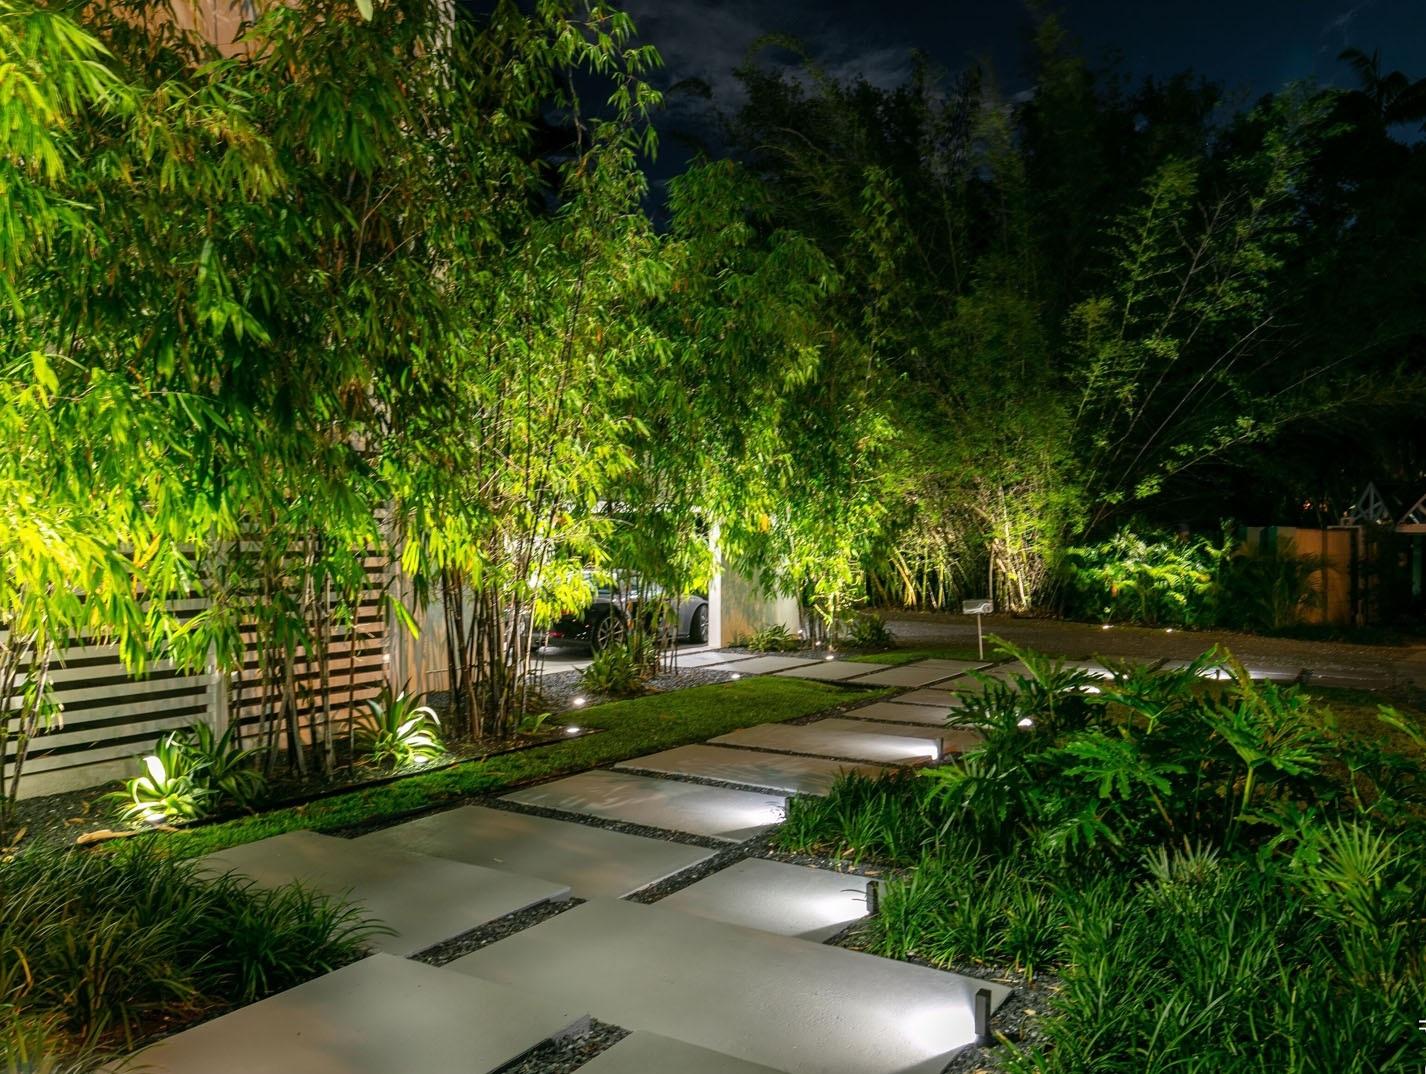 outdoor-lights-4 100+ Surprising Garden Design Ideas You Should Not Miss in 2021